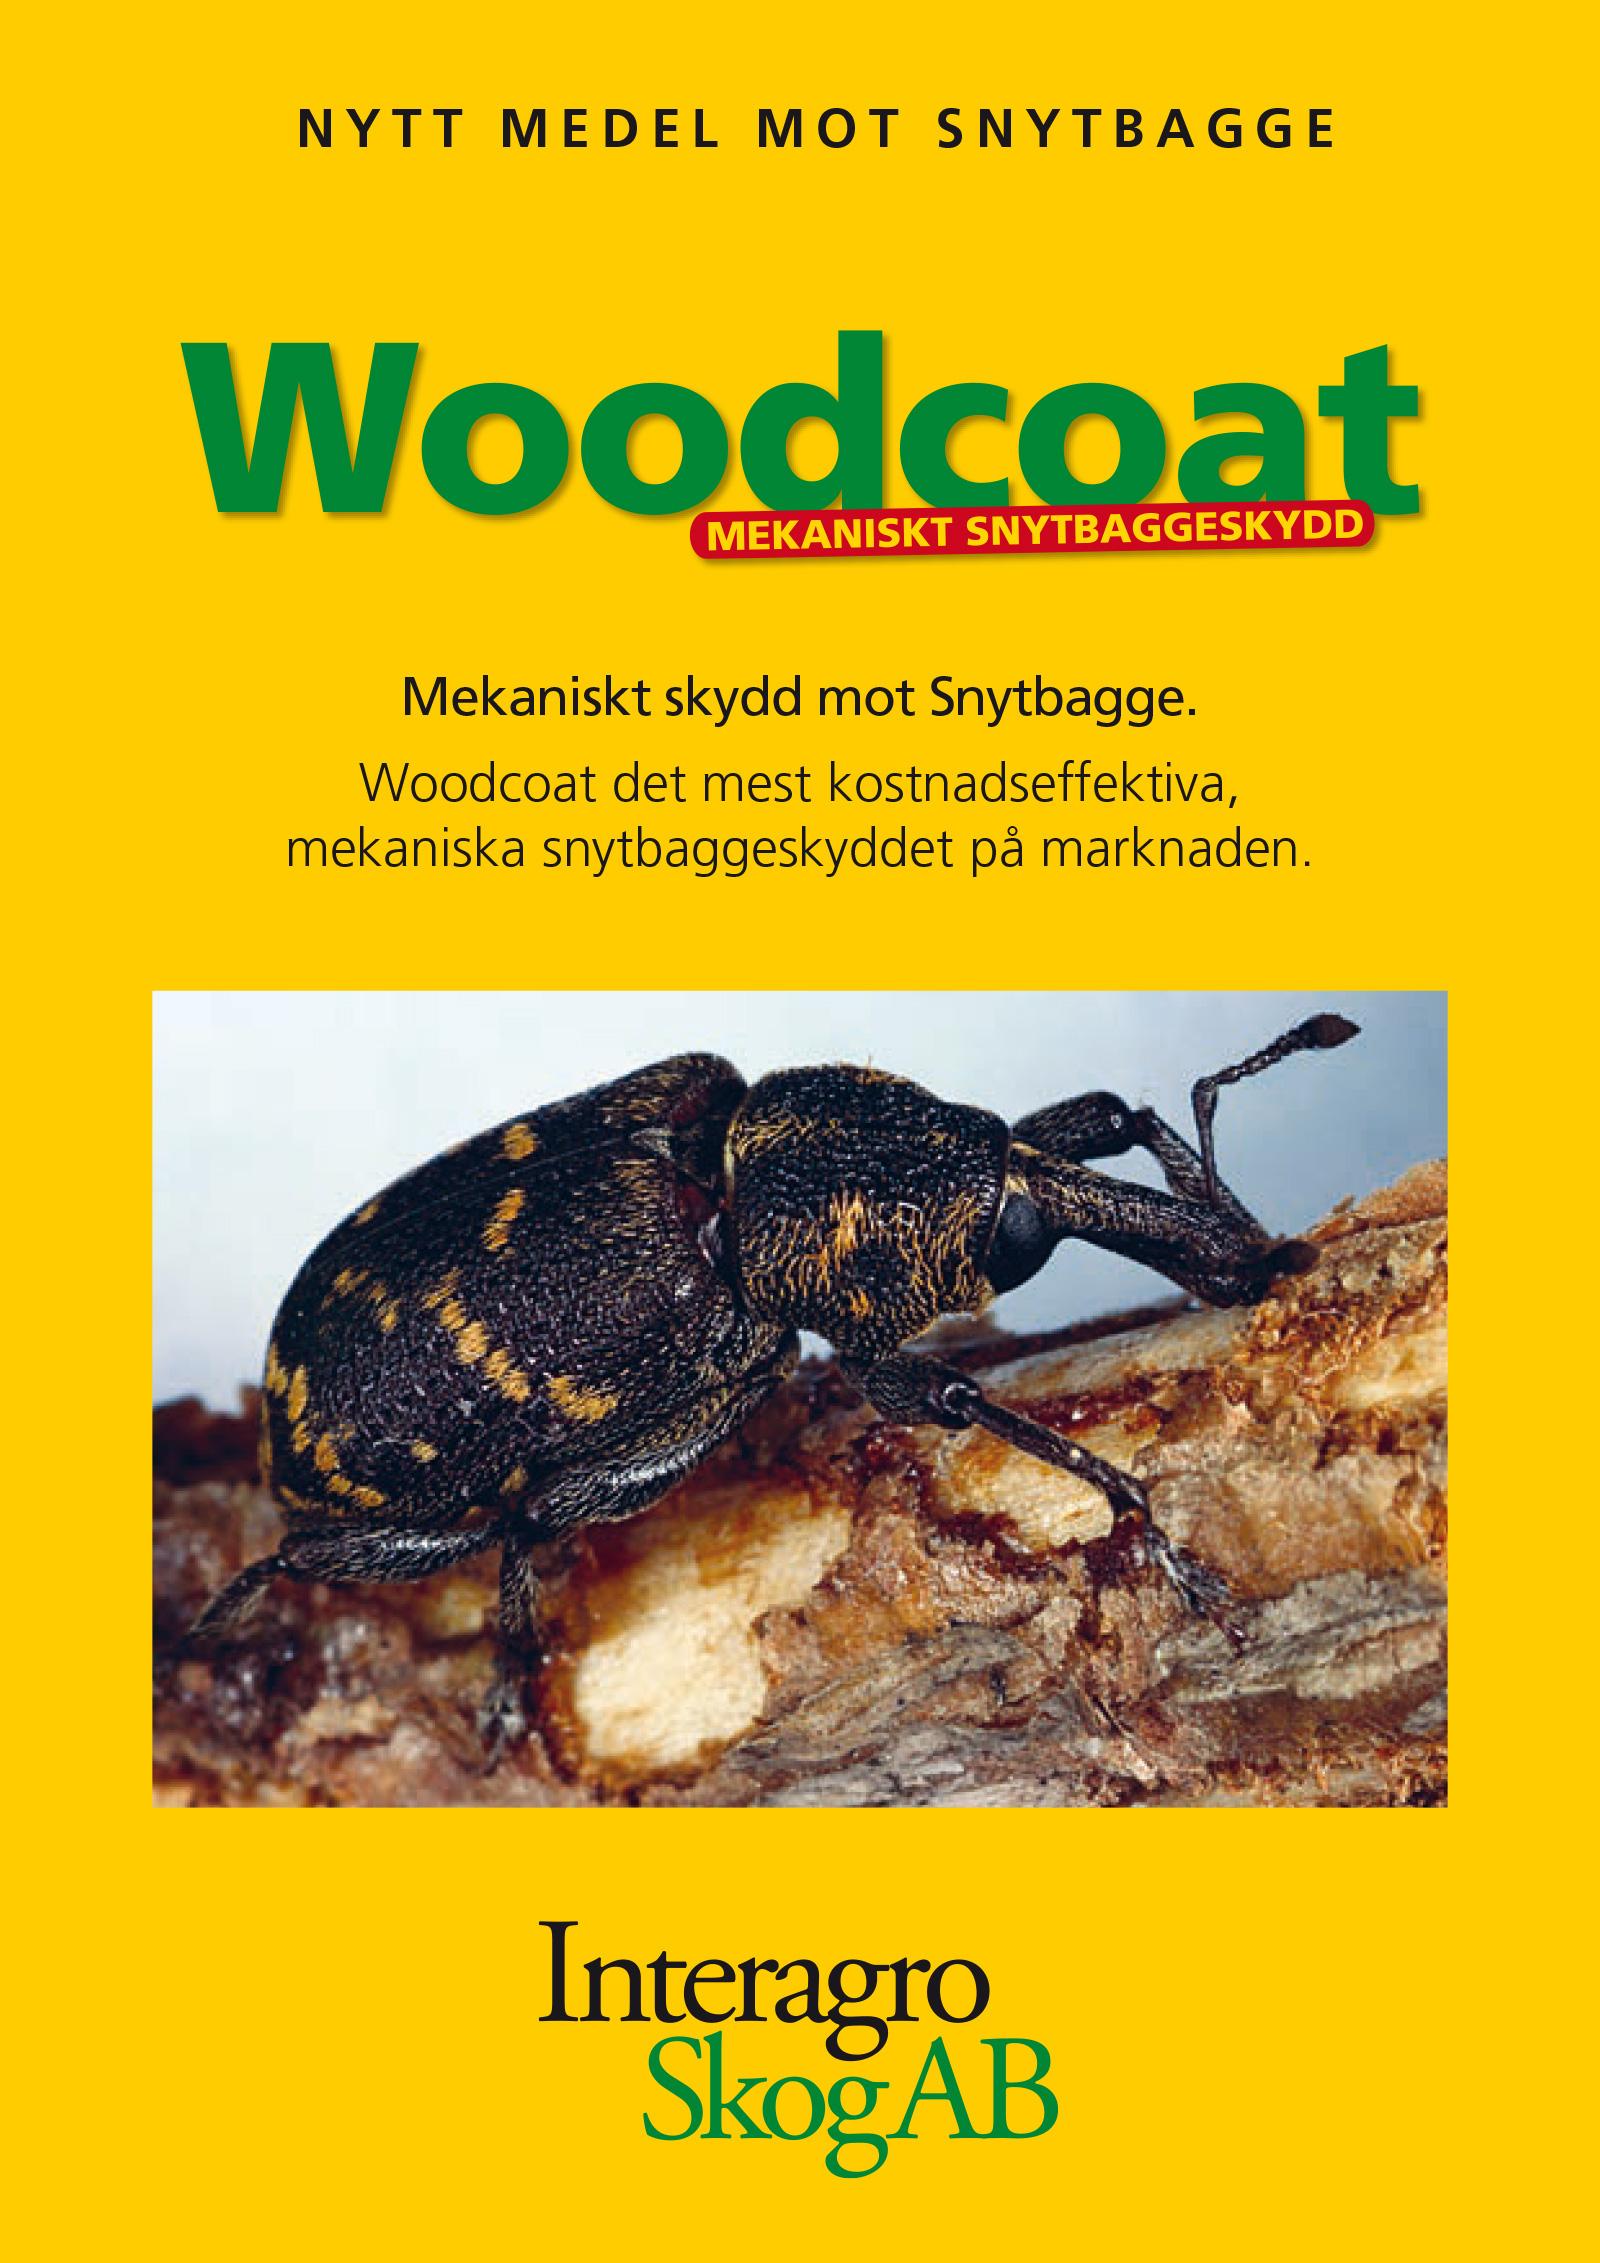 interagroskog-woodcoat-2019